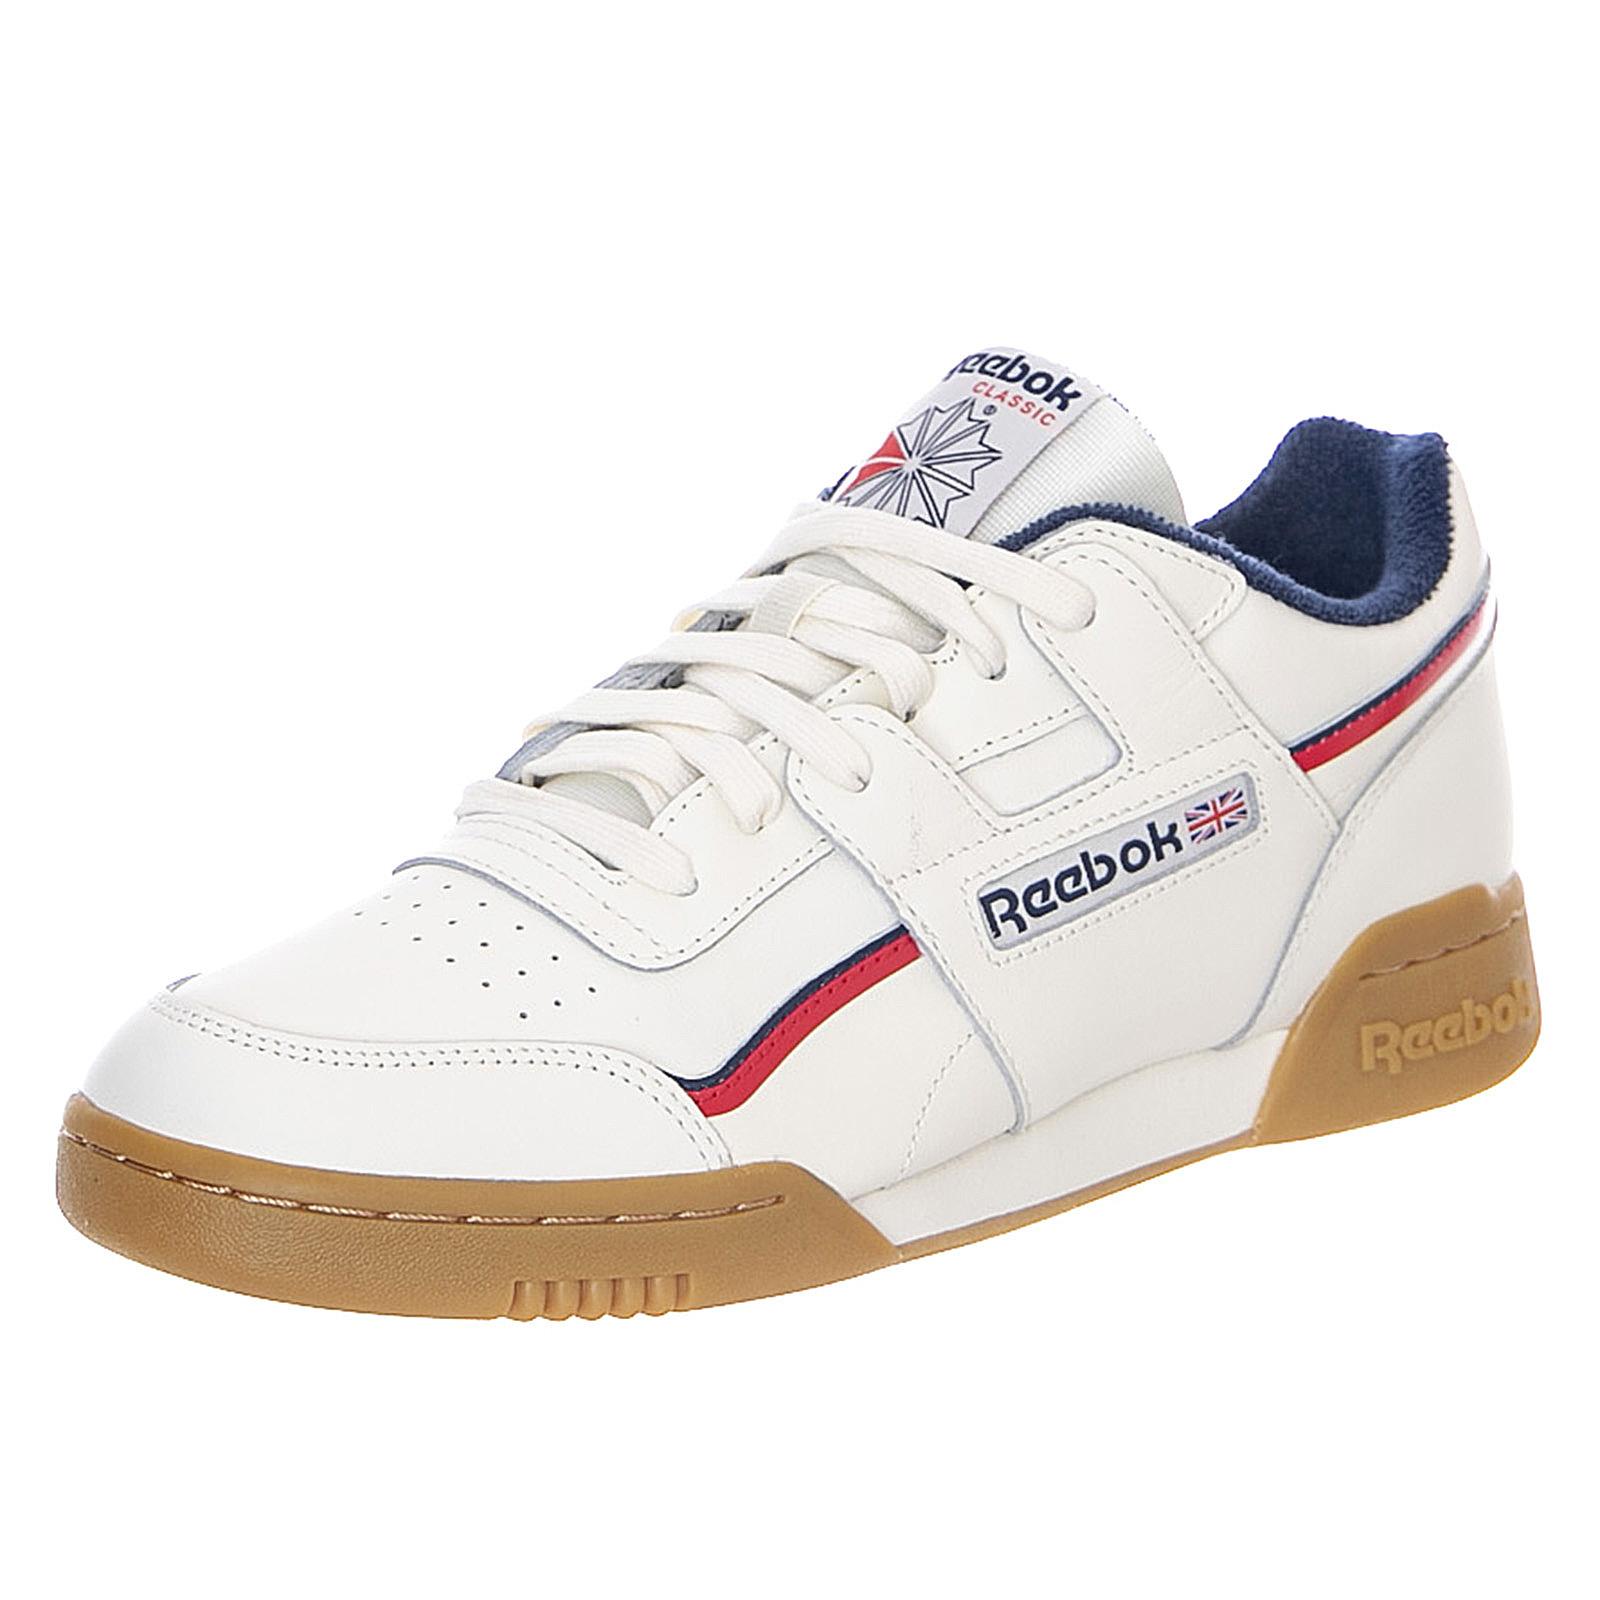 REEBOK WORKOUT PLUS BlancBleu marineRed Baskets Chaussures à lacets